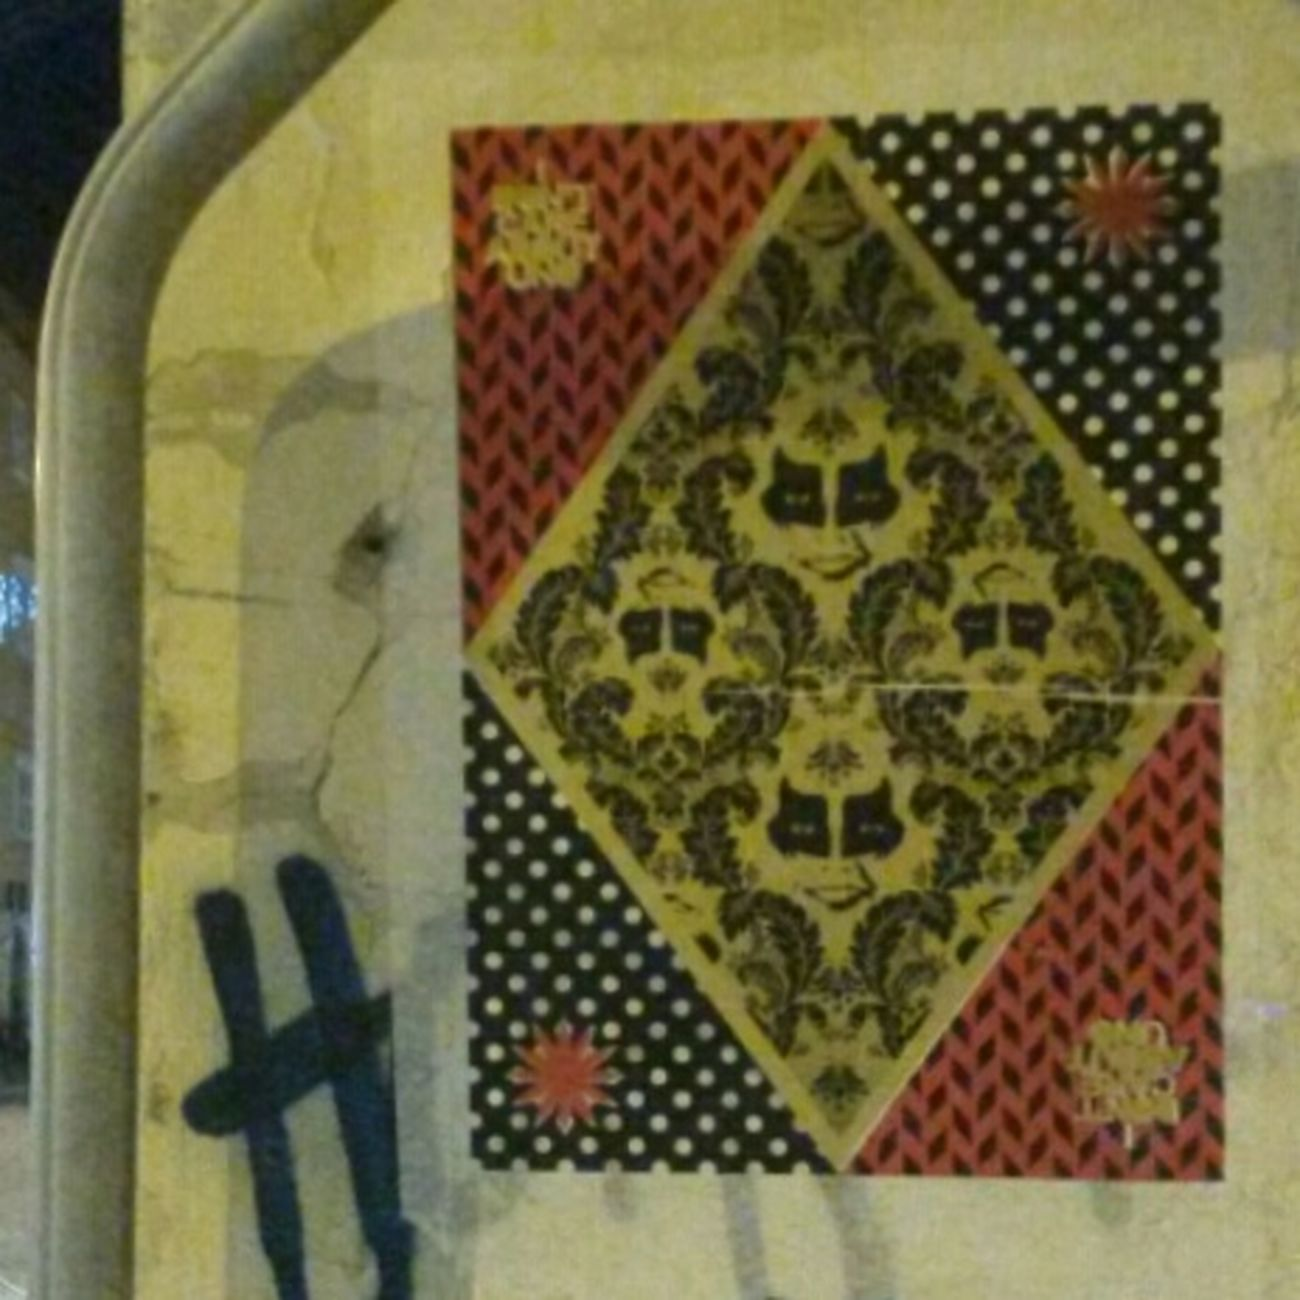 Kiss Playcard Stencil Art Streetphotography Streetart